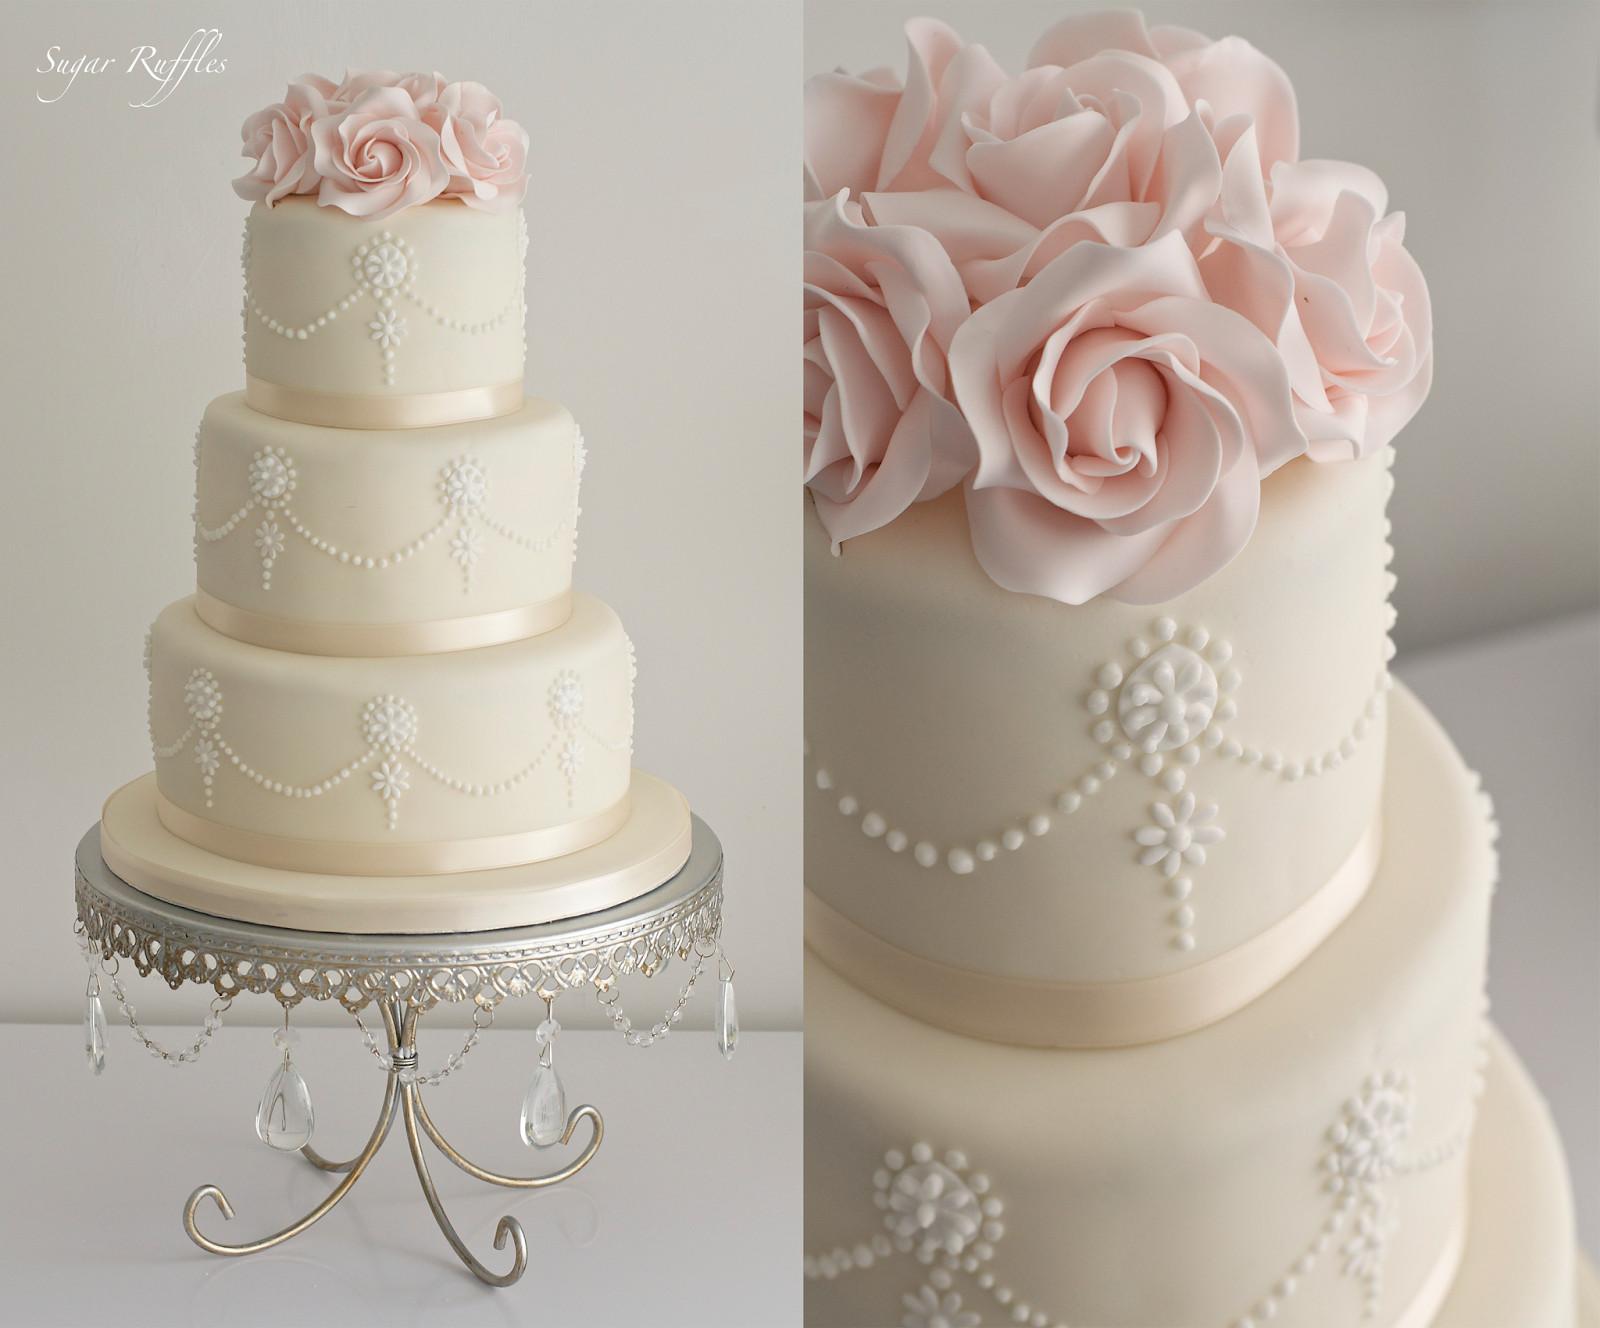 3 Layered Wedding Cakes  Three Layer Wedding Cakes